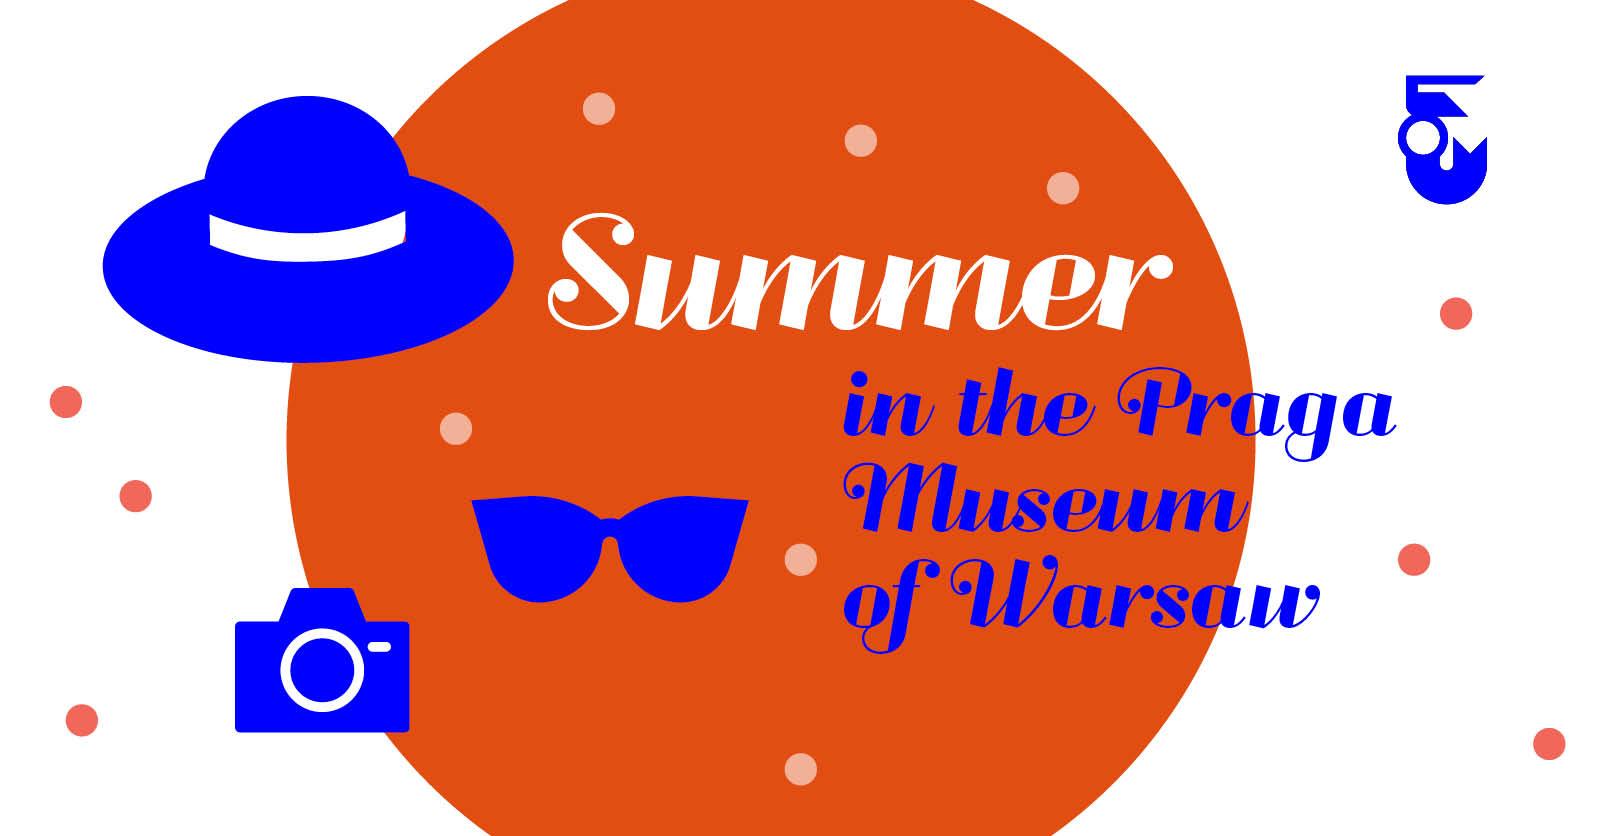 Summer in The Praga Museum of Warsaw